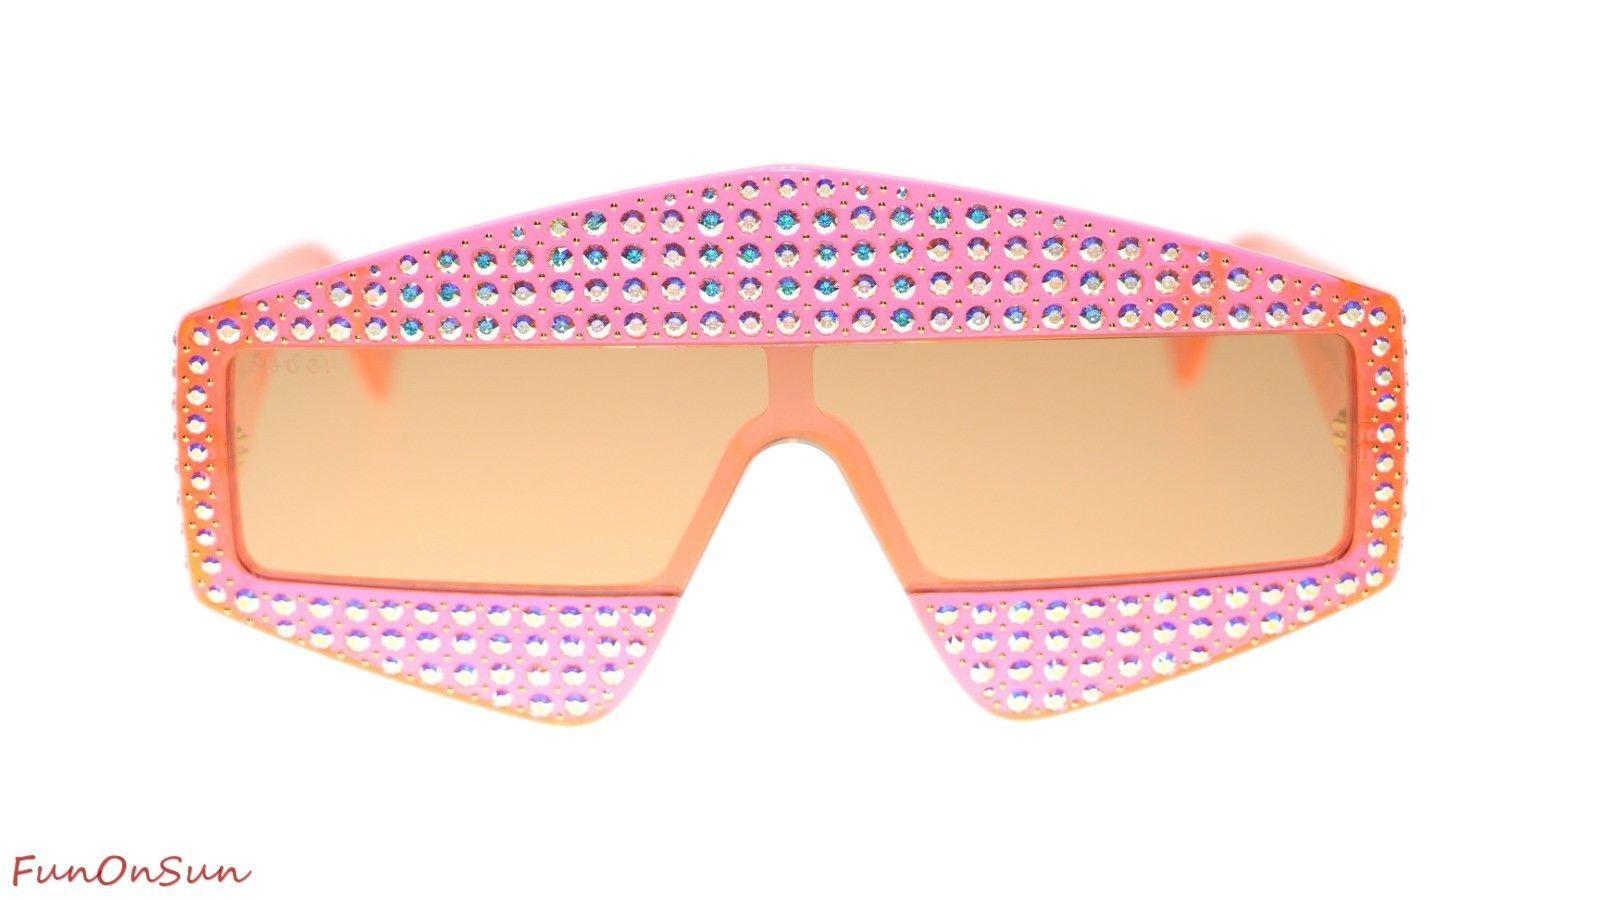 f821a1476b0 S l1600. S l1600. Previous. Gucci Women Rectangular Sunglasses GG0357S 002  Orange ...